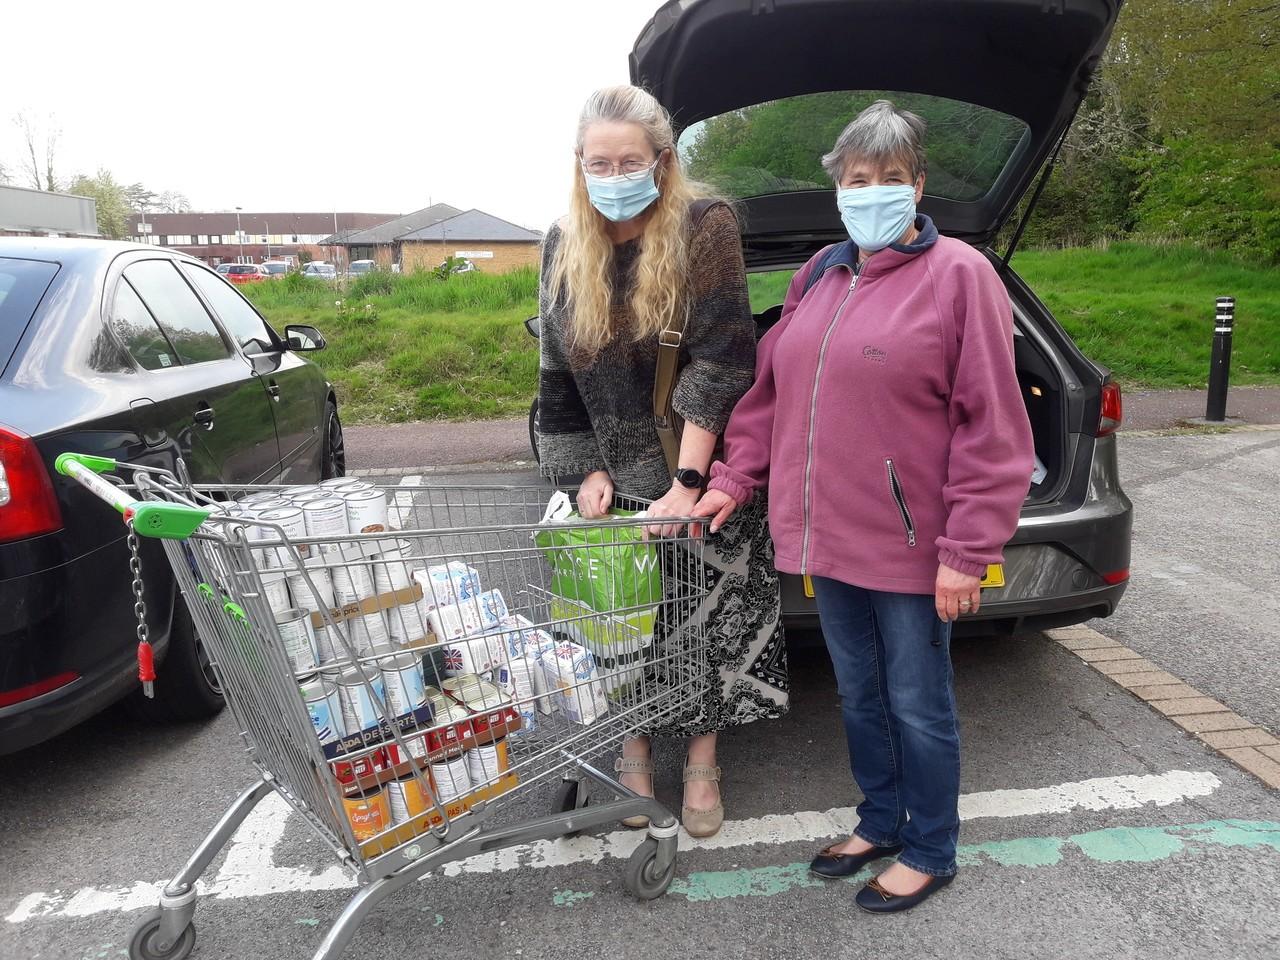 Bettws Food Bank donation | Asda Newport